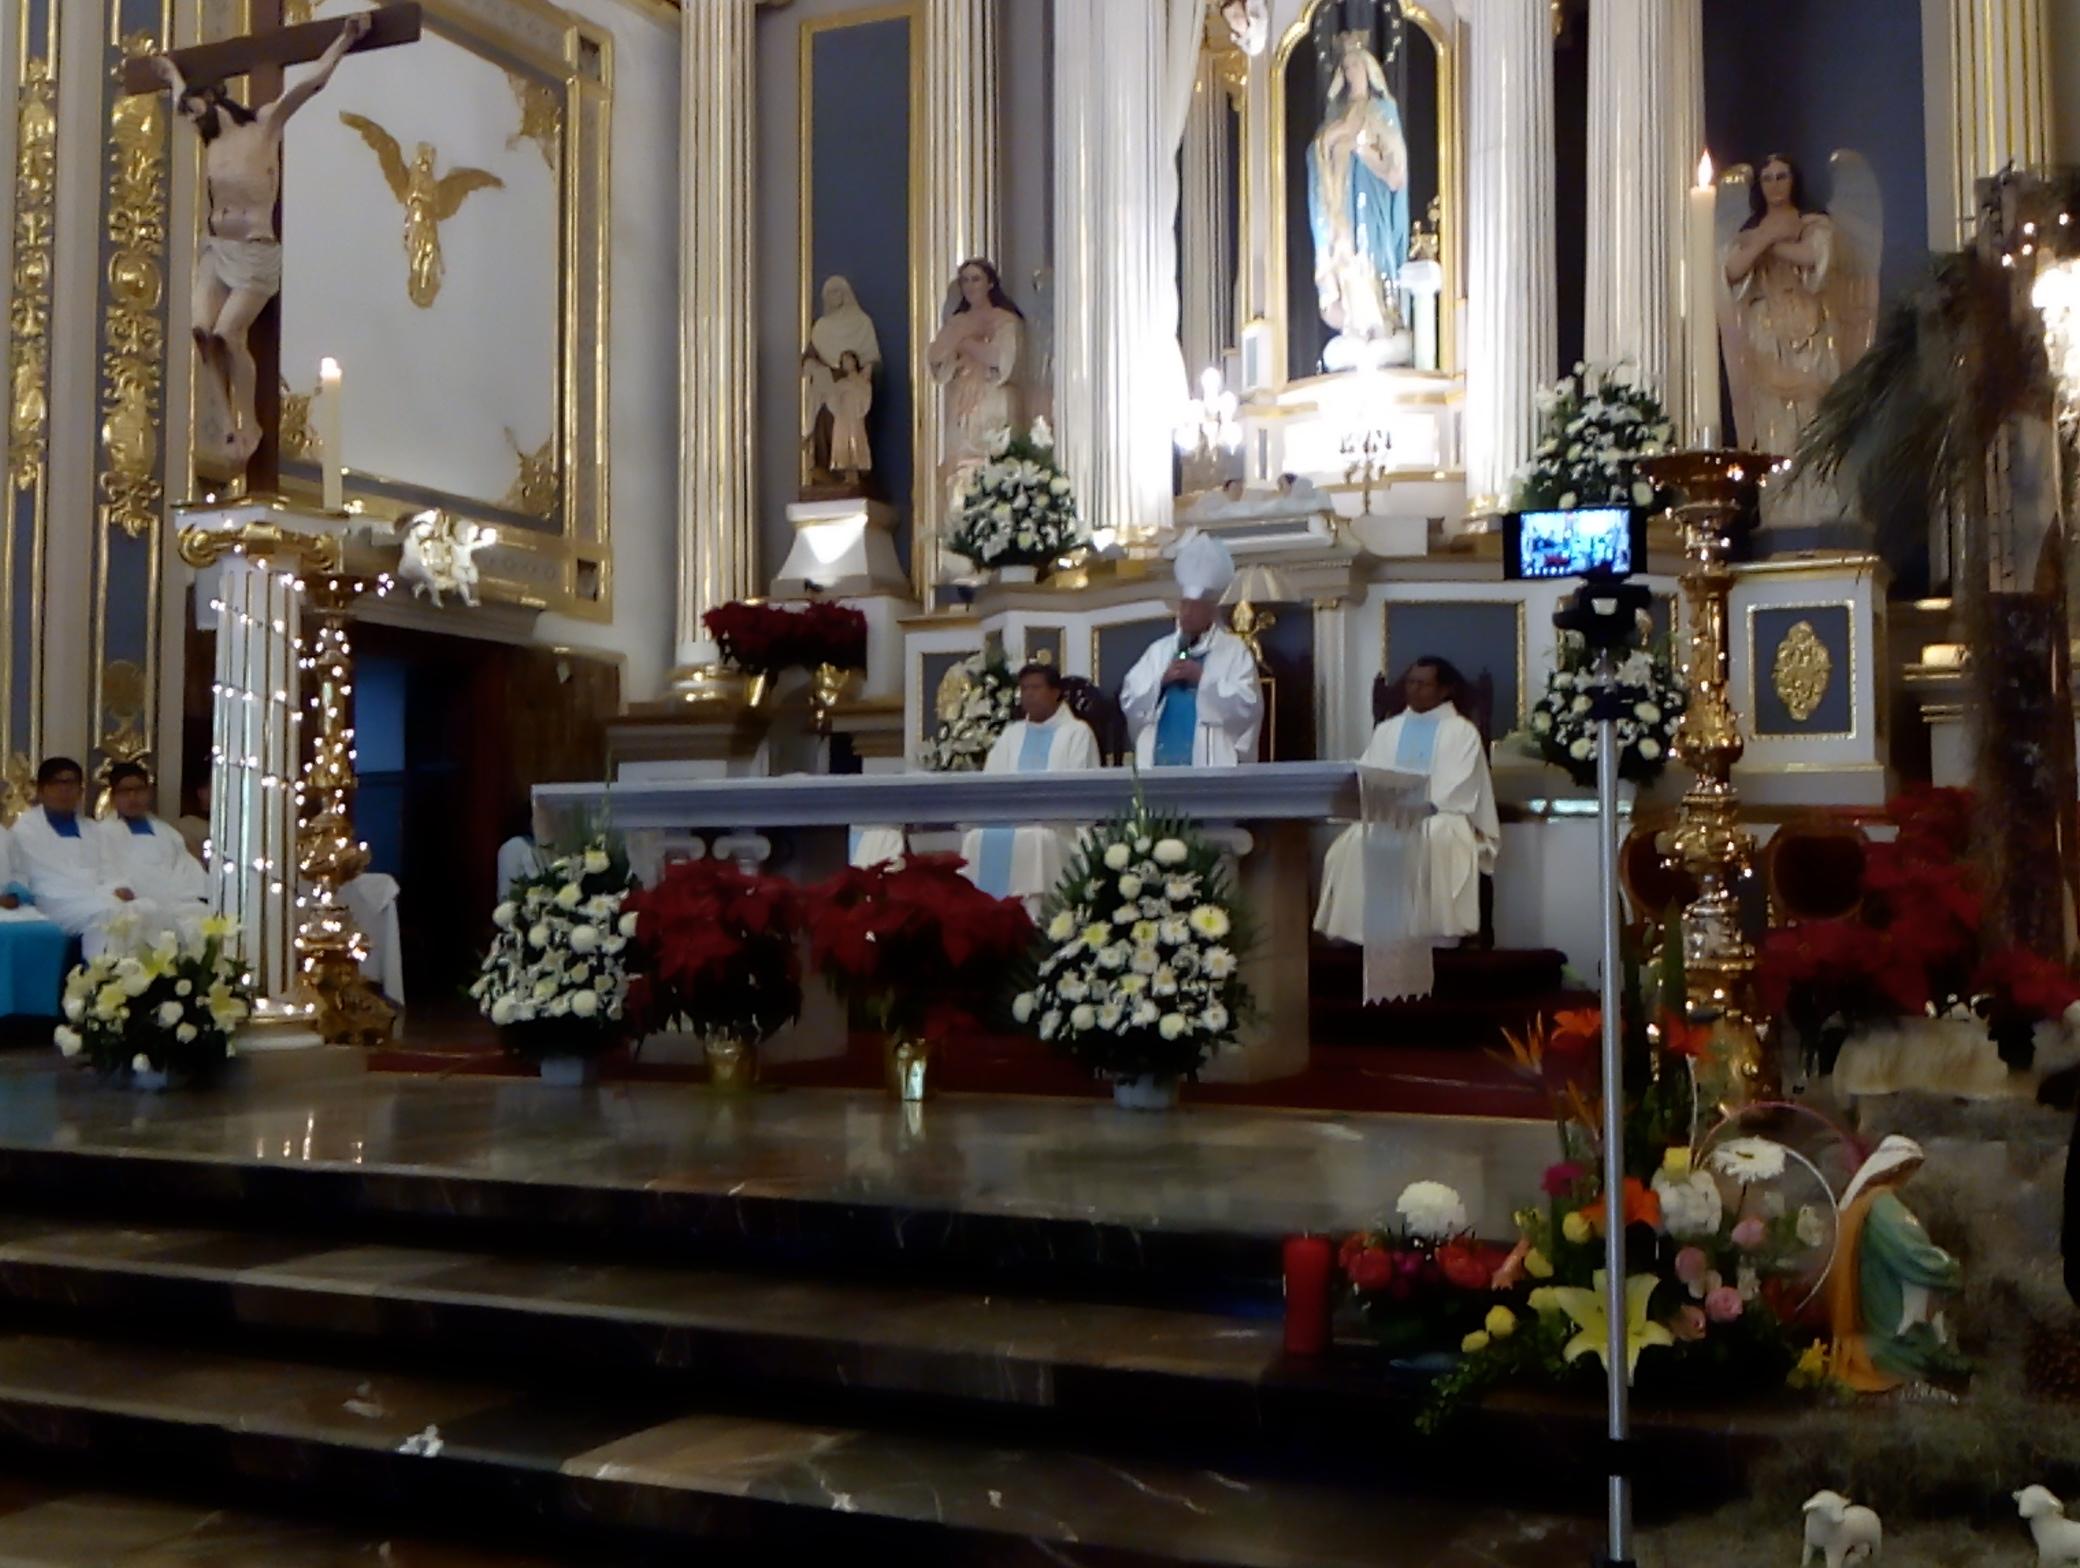 Alerta Diócesis de Tehuacán sobre estafas en redes sociales a fieles